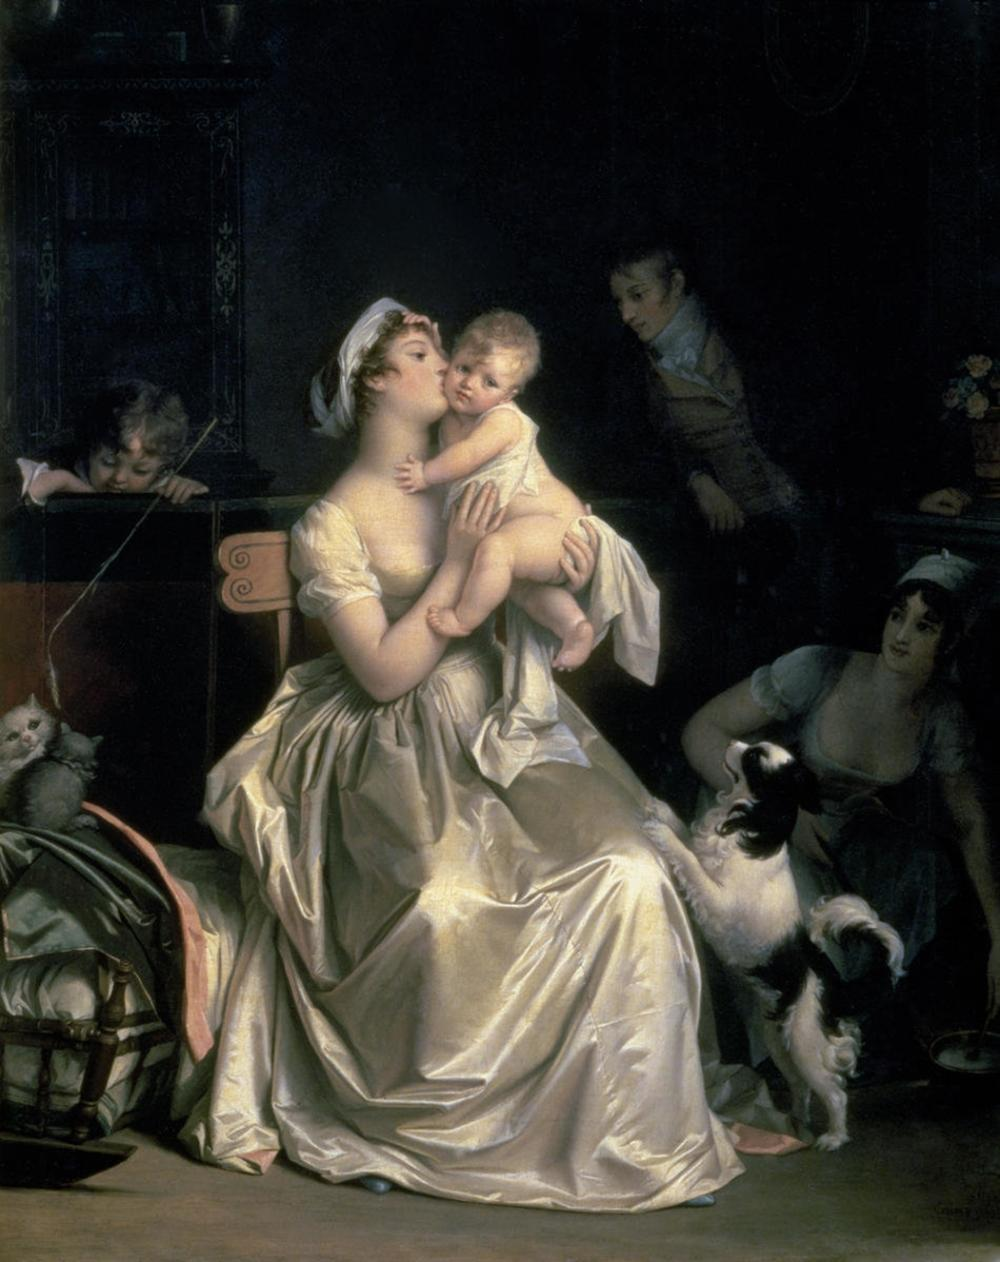 MARGUERITE GERARD MOTHERHOOD, 1805